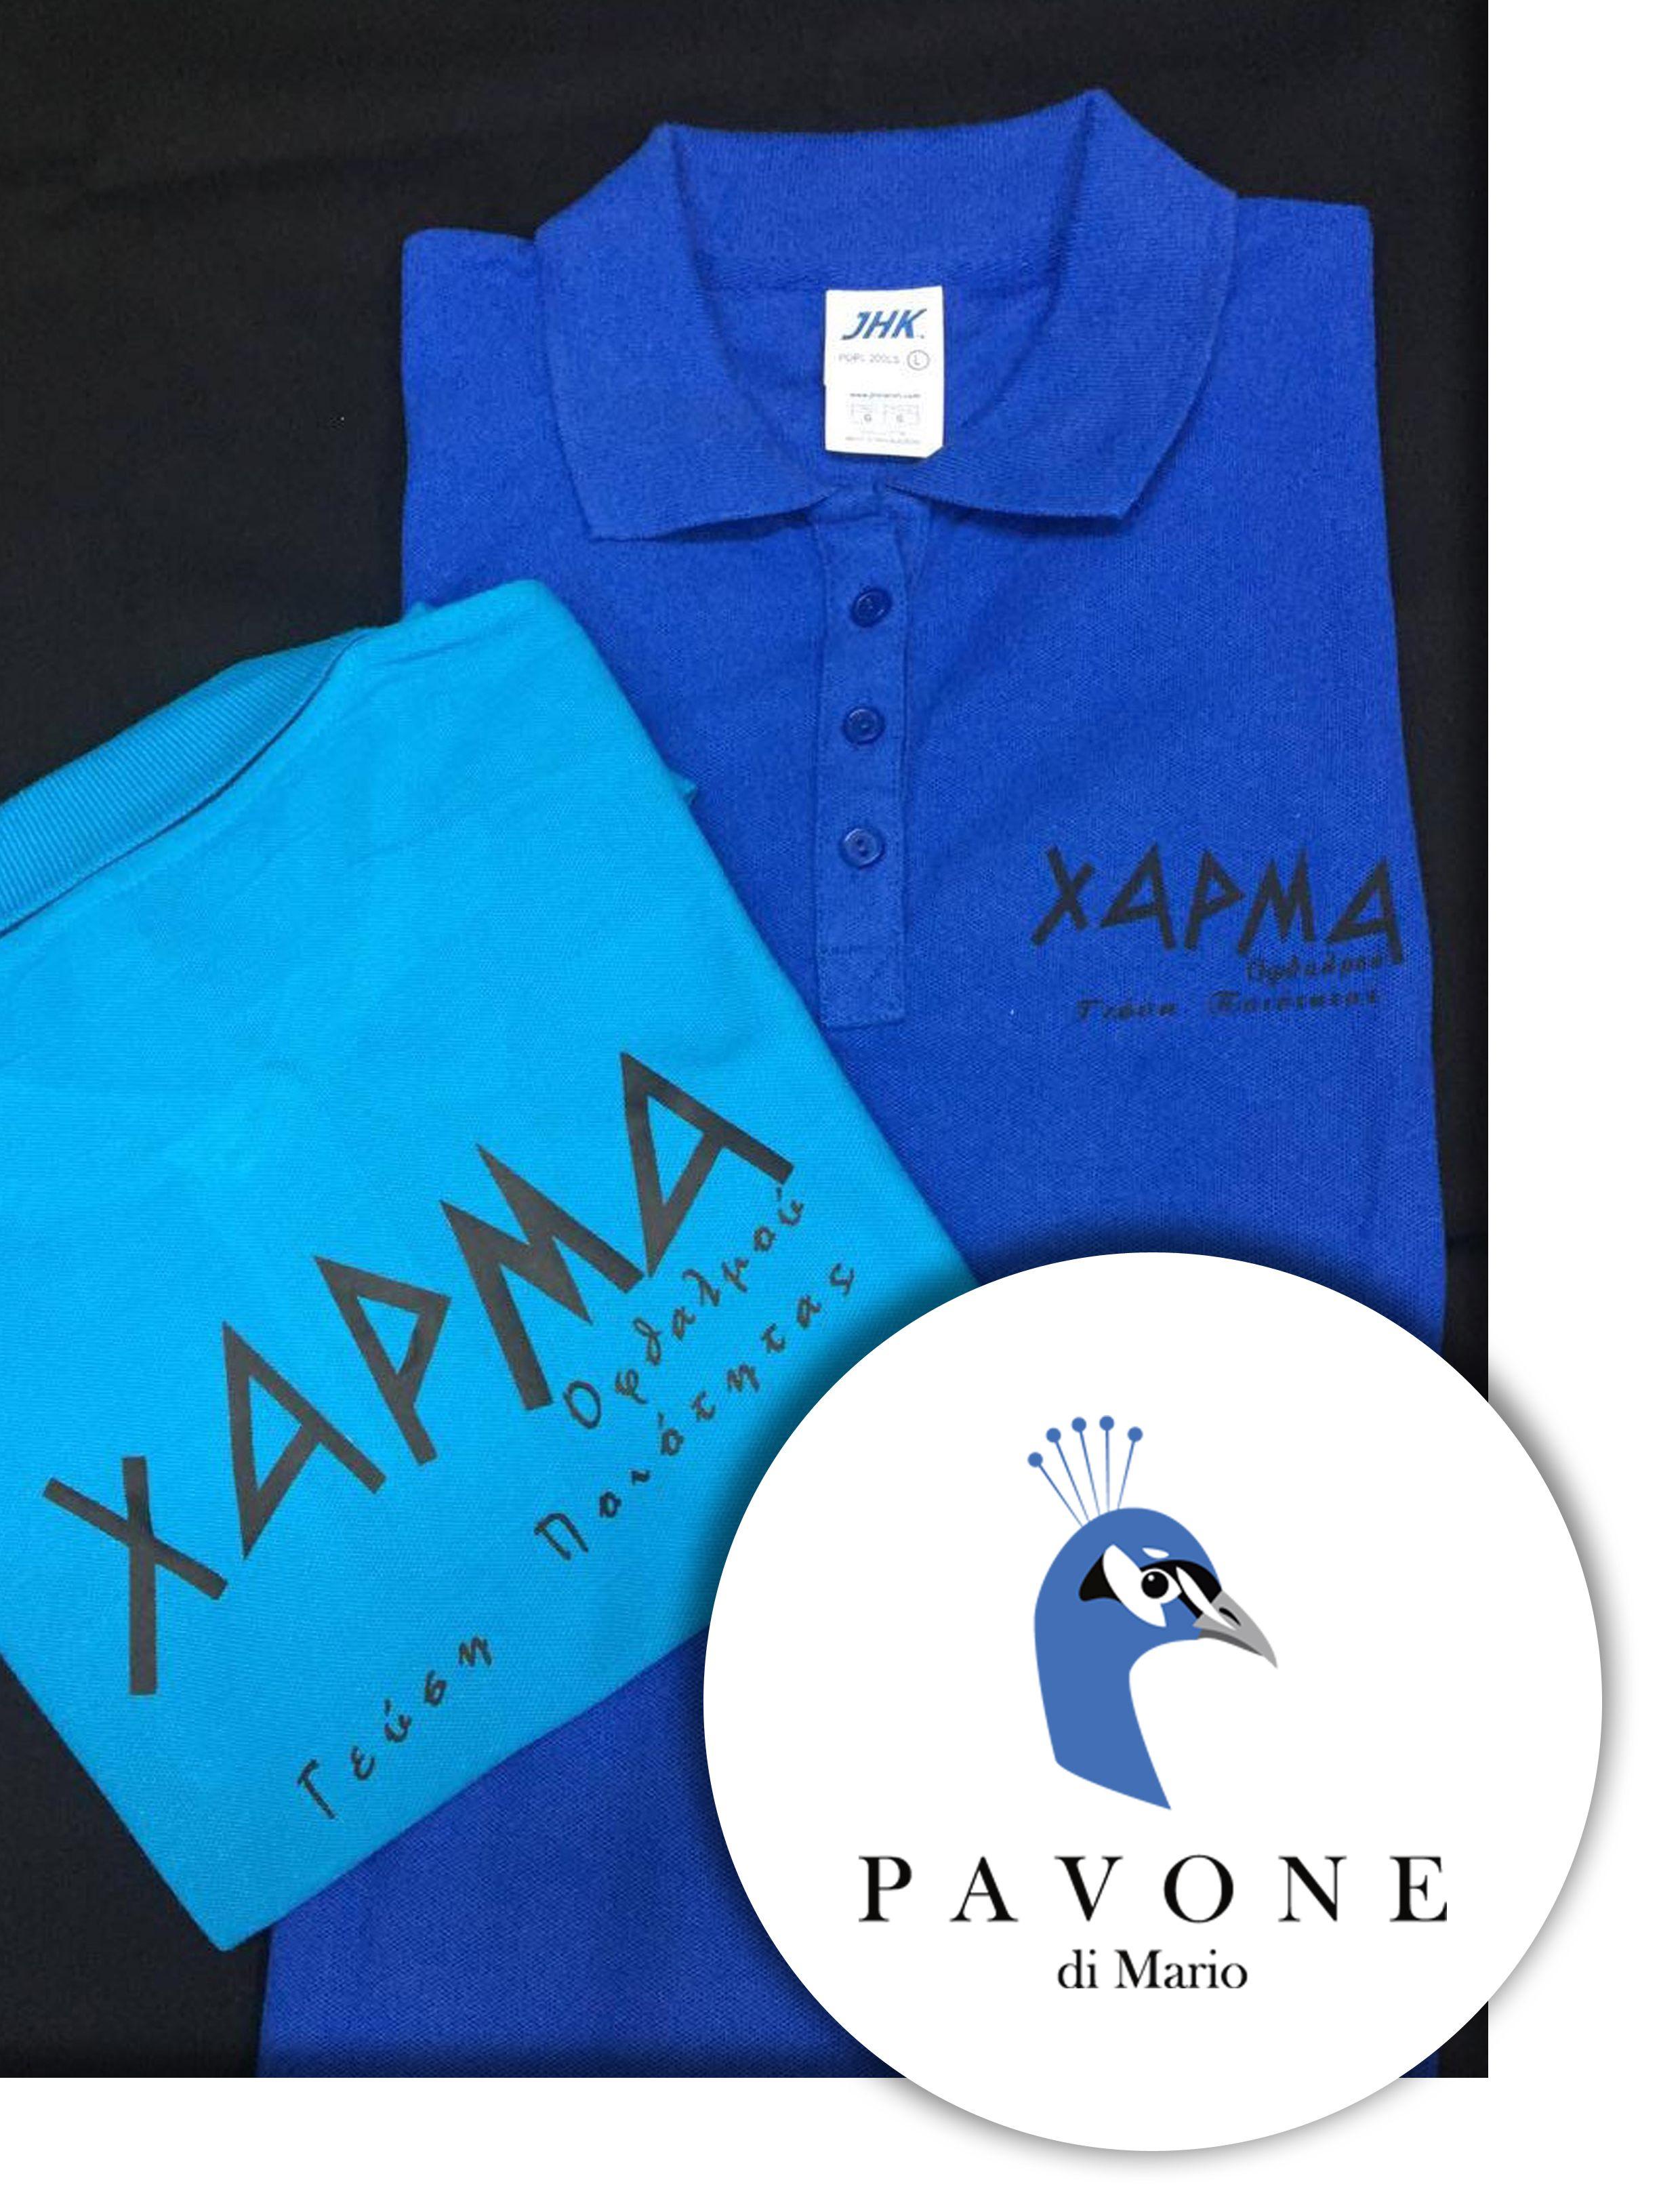 95a08e160cb8 Μπλουζάκι Polo 100% cotton pique κοντομάνικο με στάμπα στην πλάτη και στο  στήθος το logo